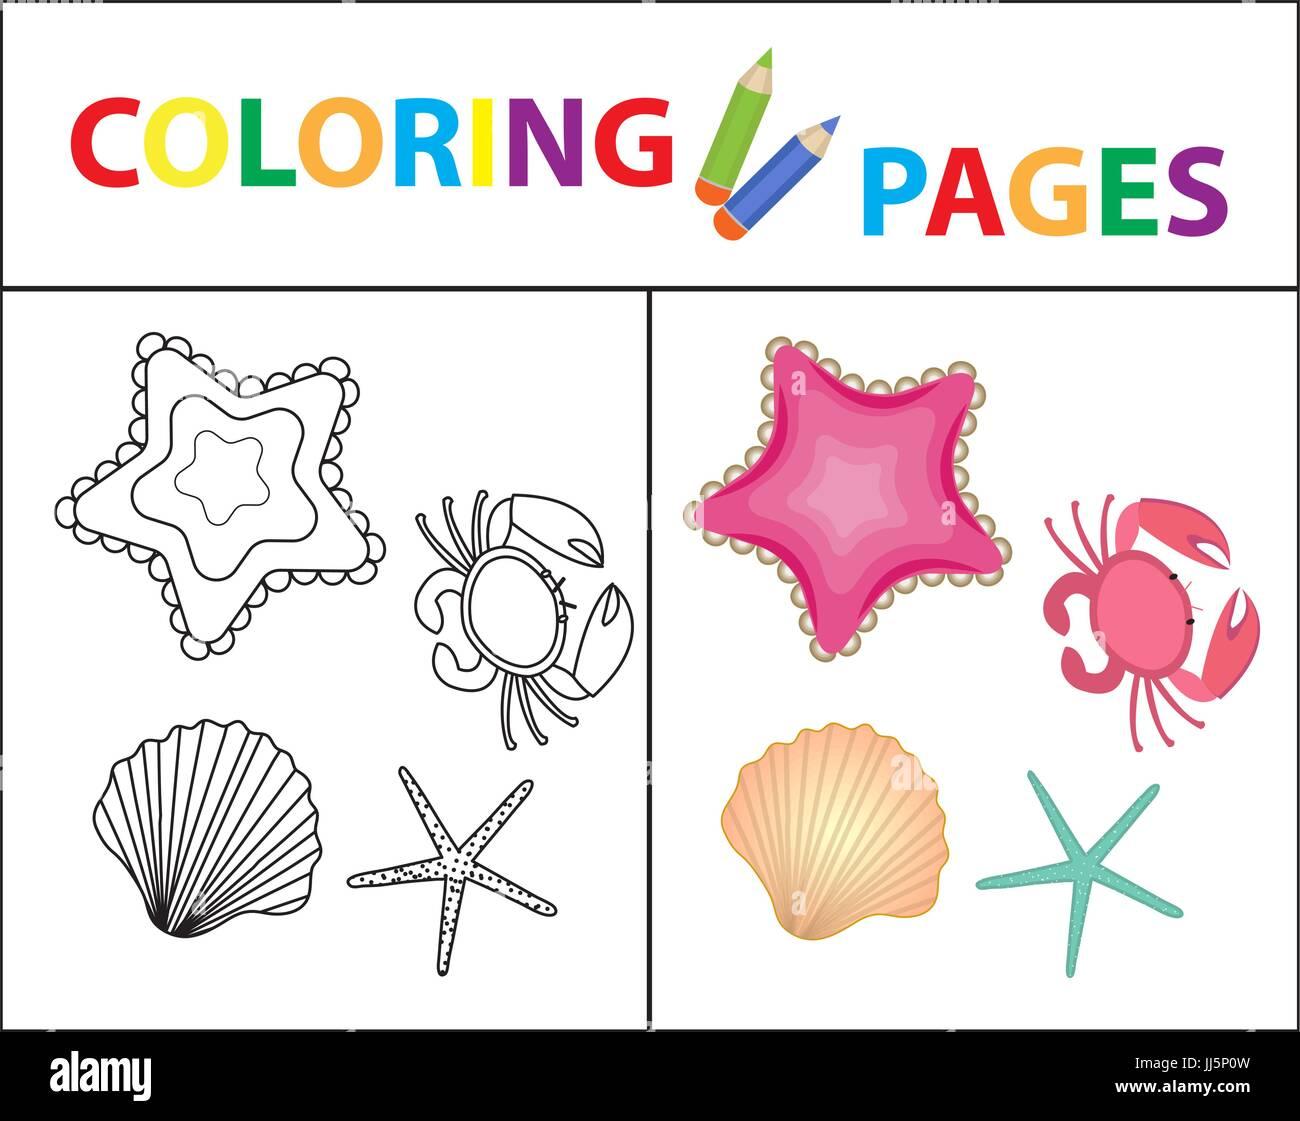 Coloring Book Seite. Satz, Sterne, Muschel, Krabbe, Perle. Skizze ...